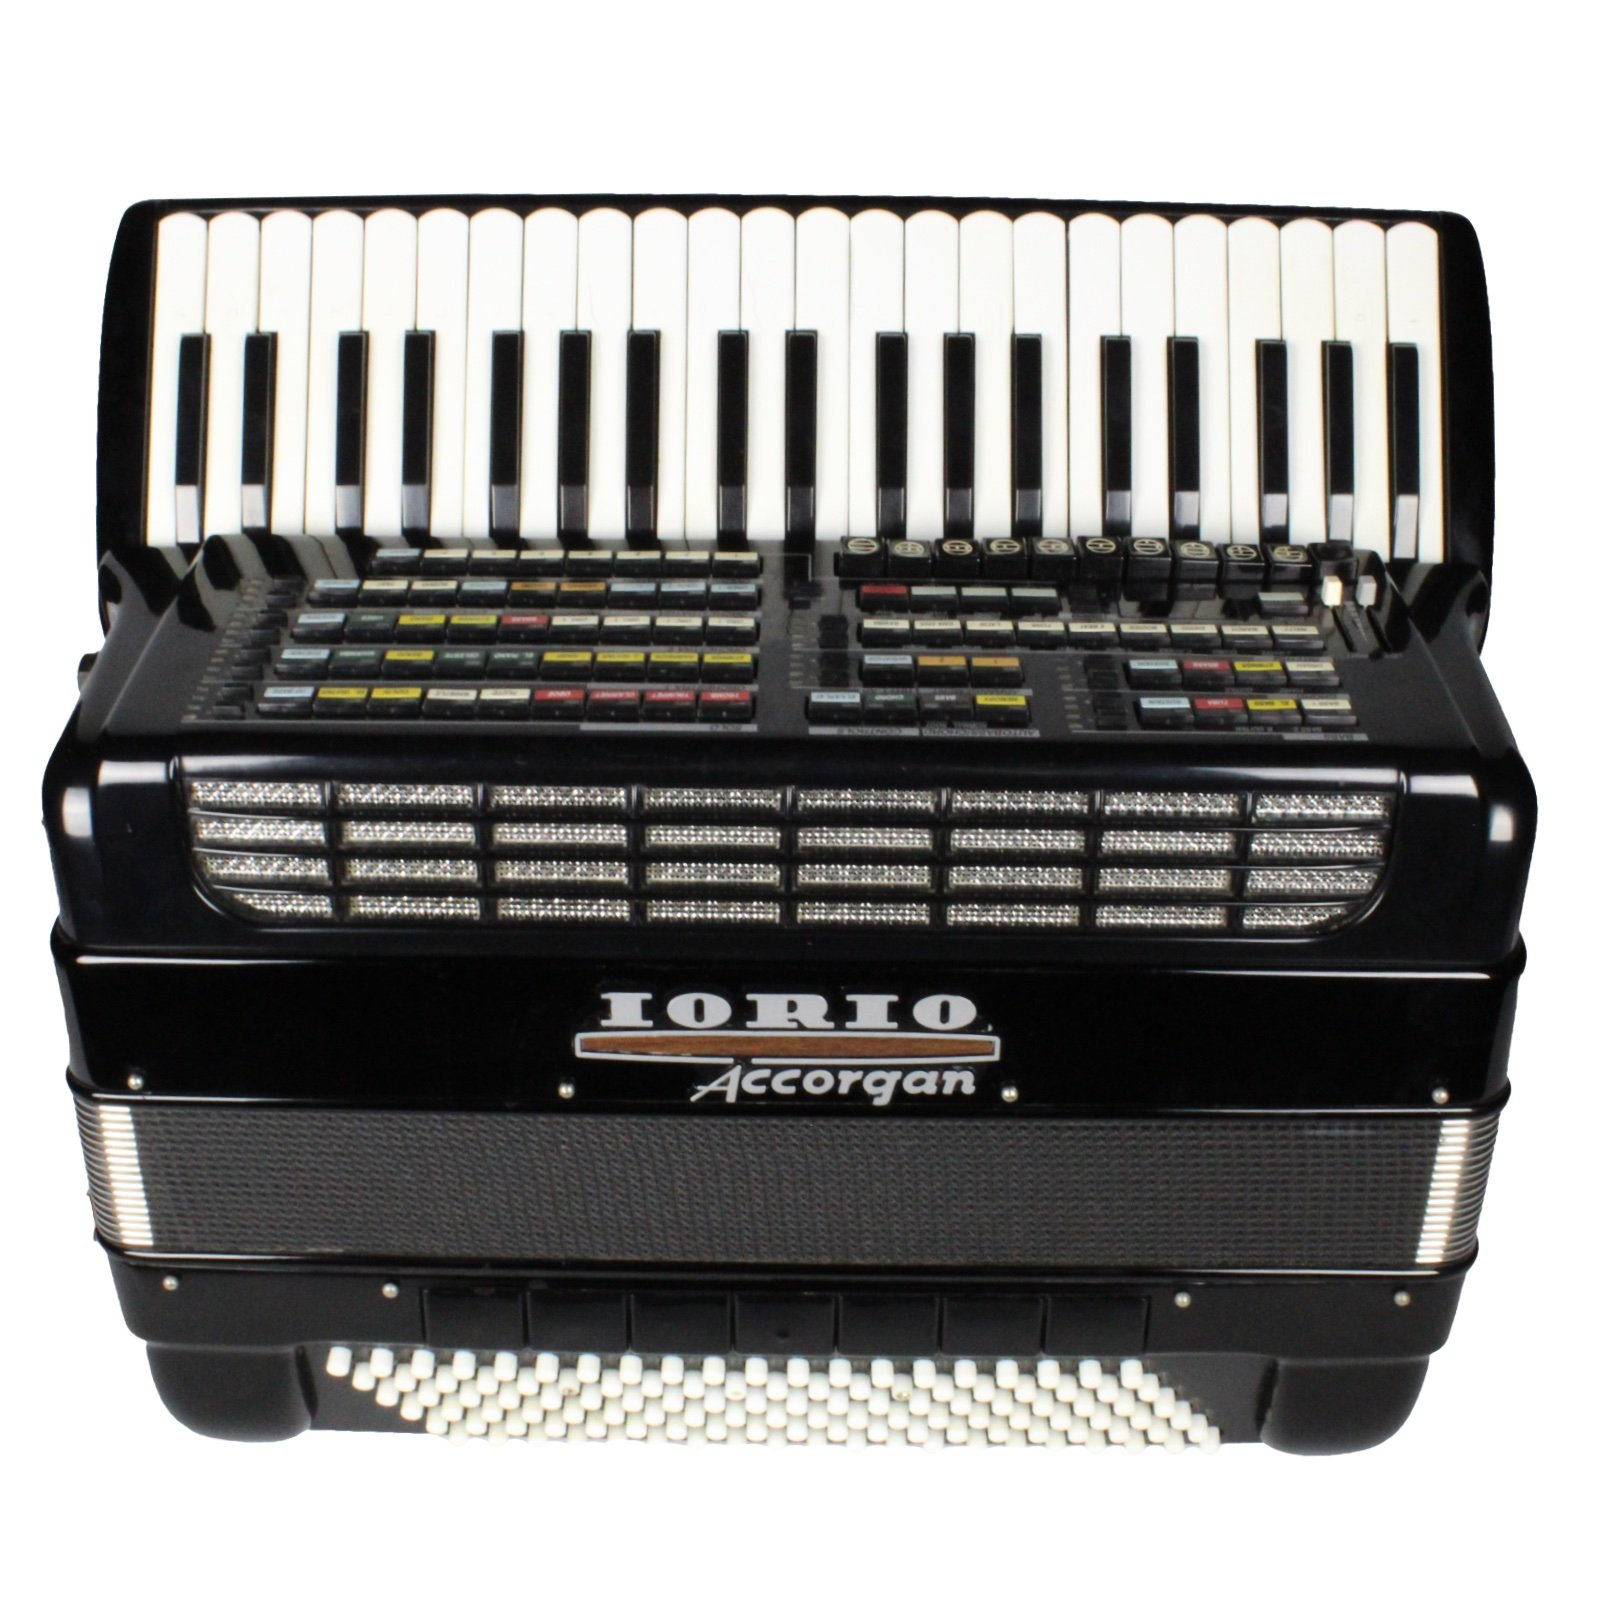 Iorio Accorgan 610A Piano Accordion LMMM 41 120 w/ Case (USED)